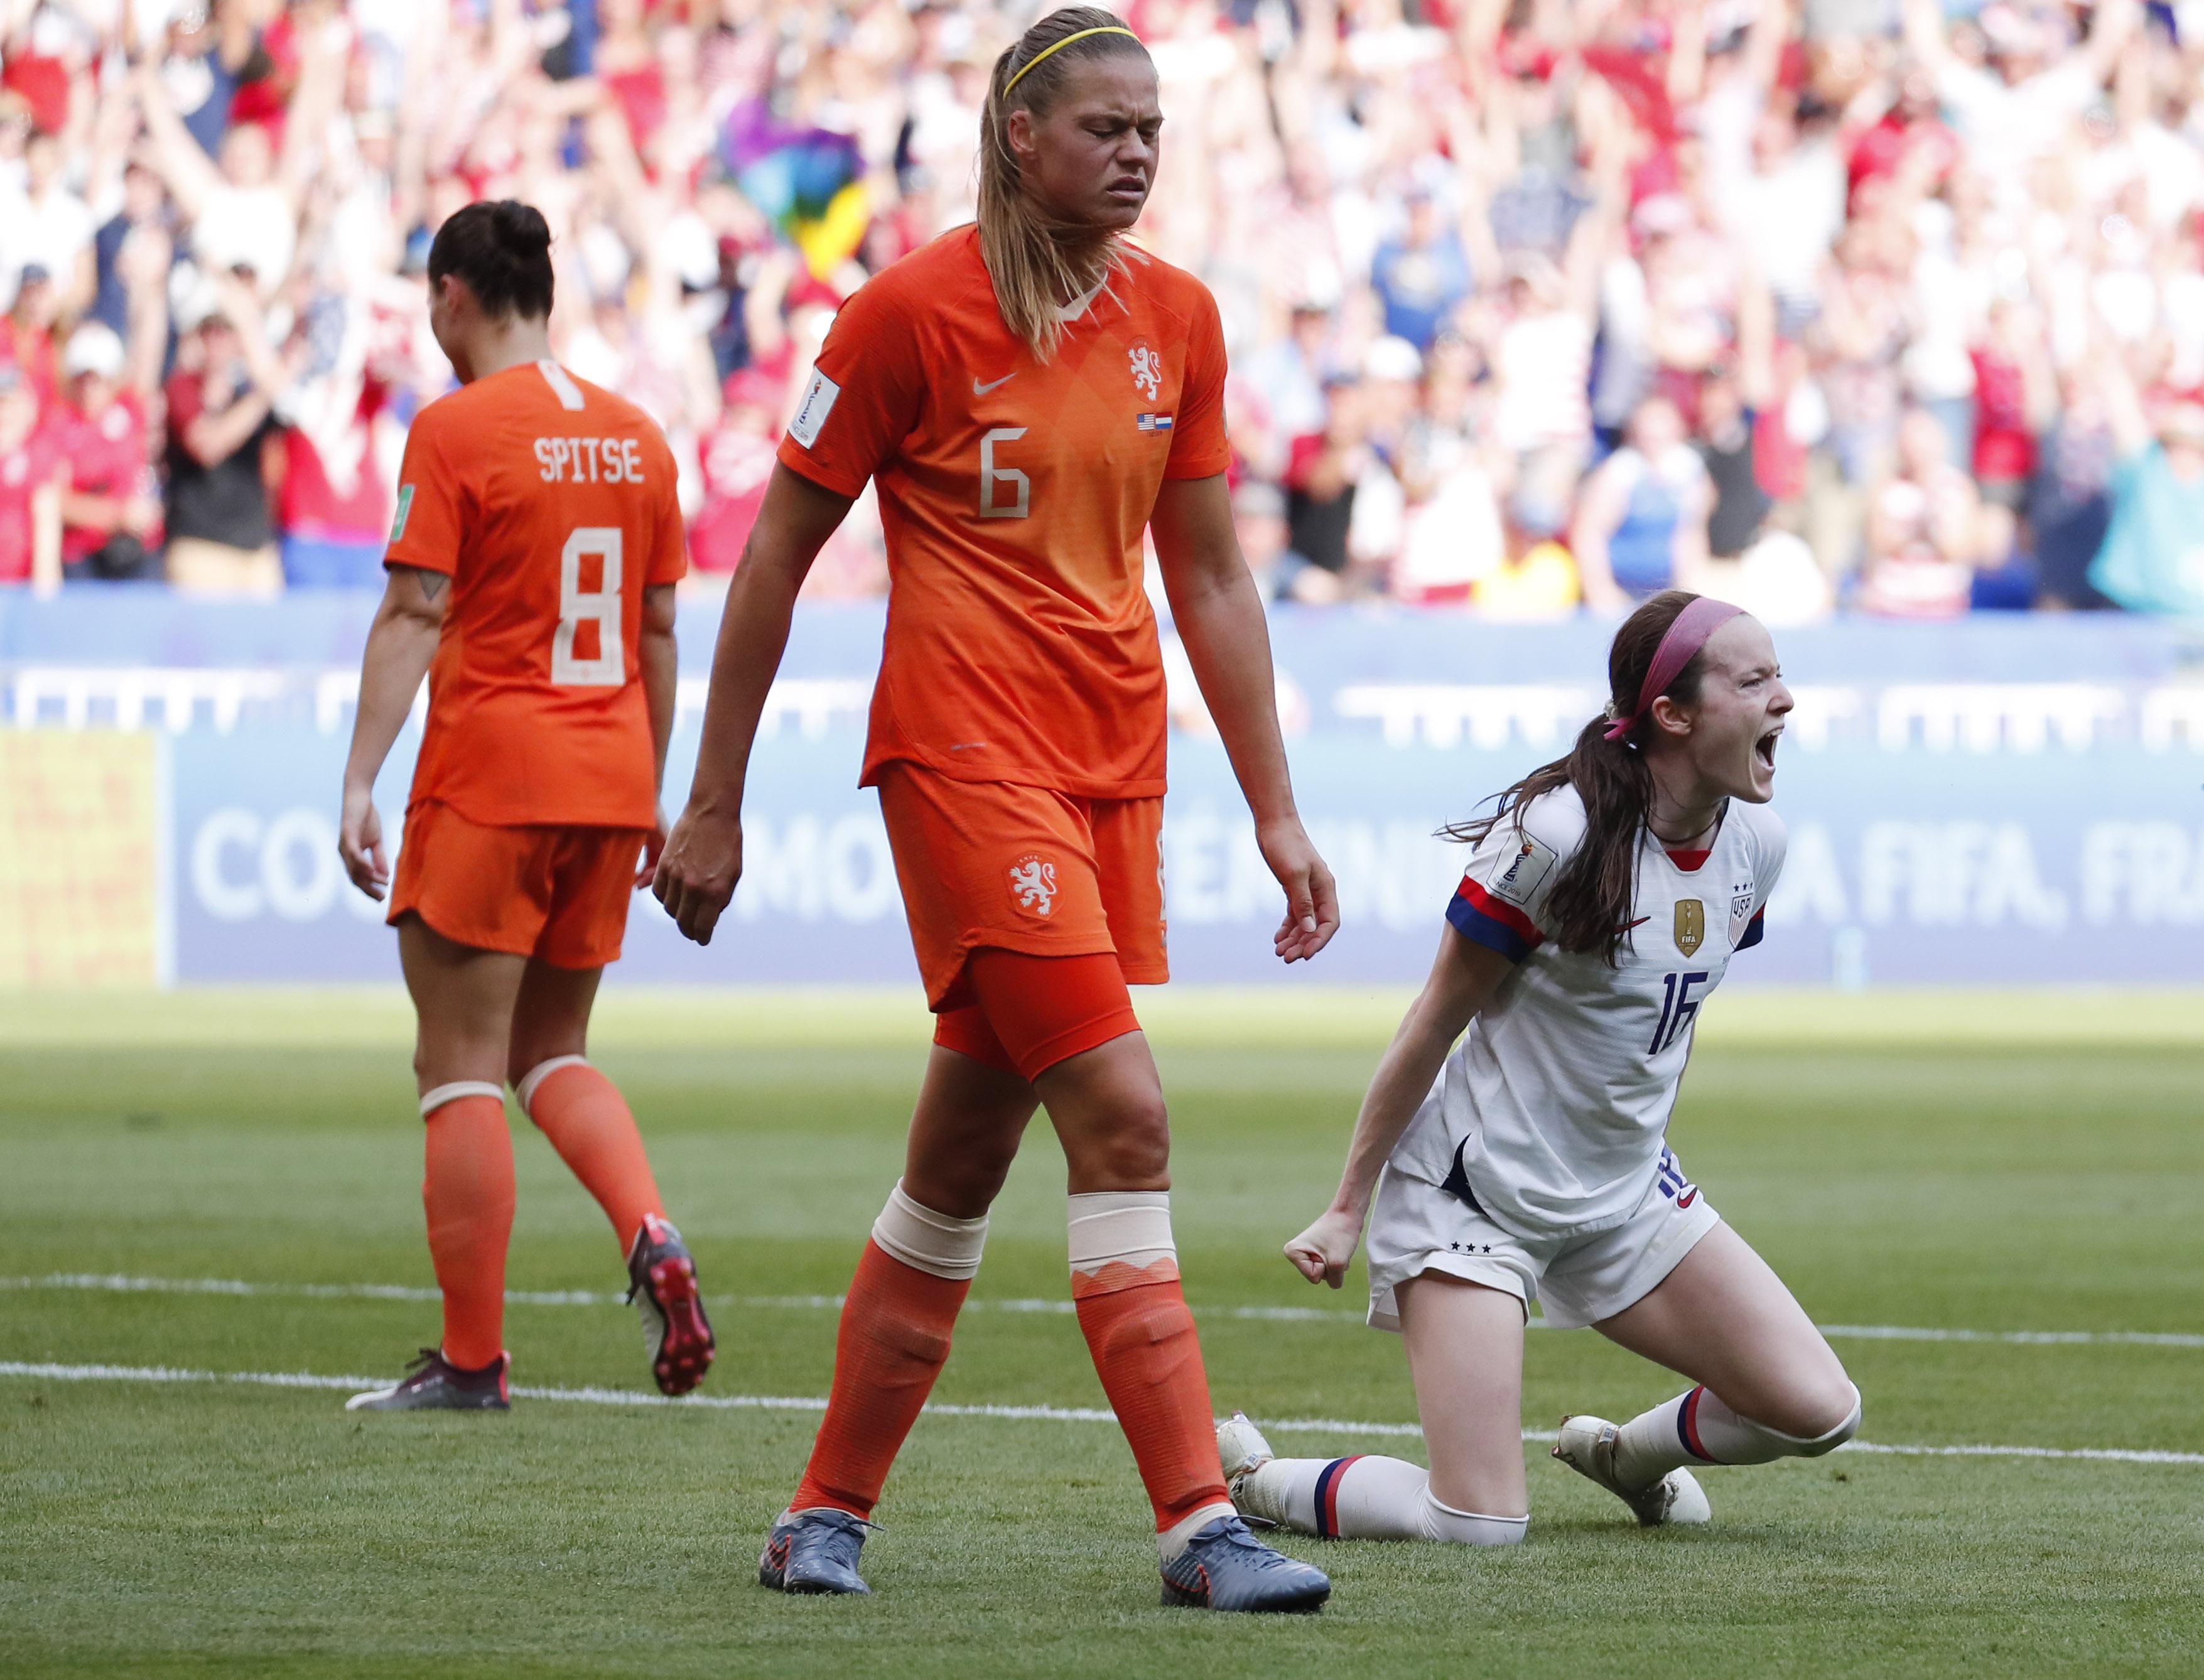 Soccer: Womens World Cup-USA vs Netherlands